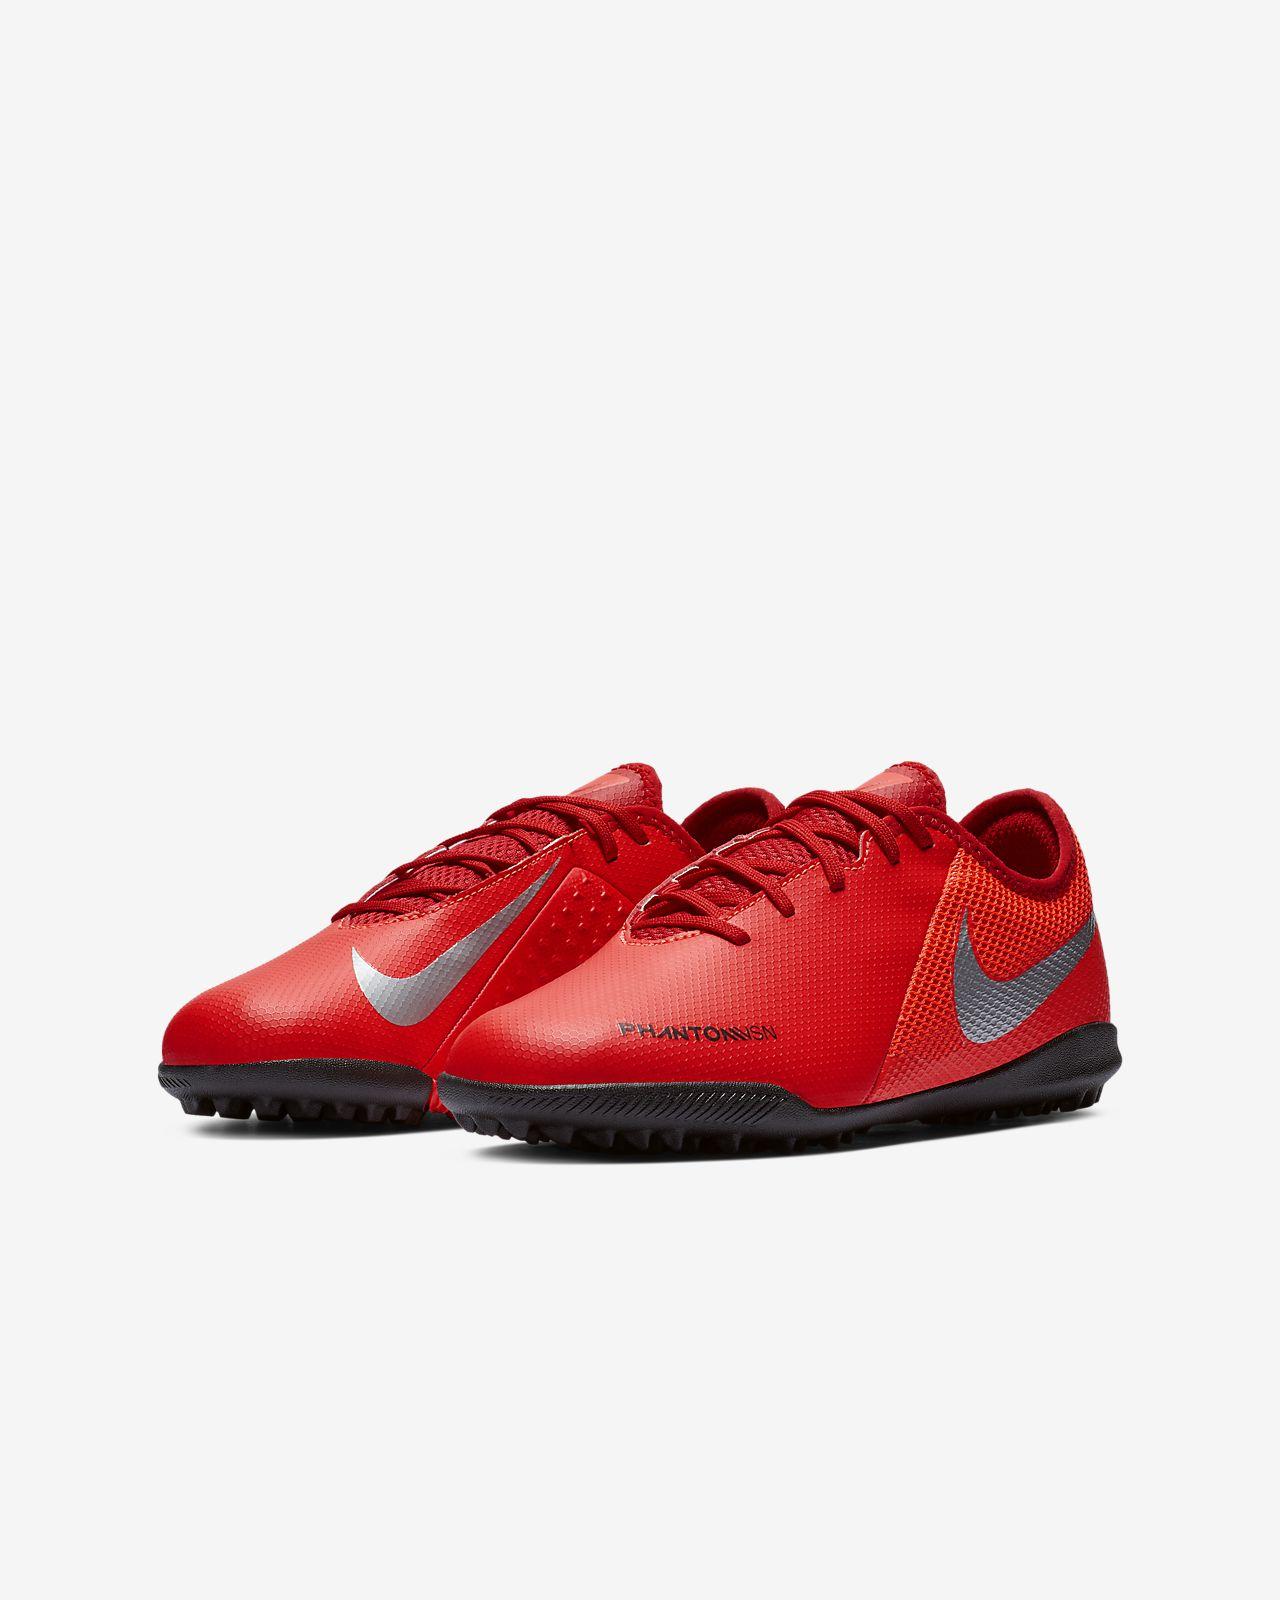 6b52a652ff6b ... Nike Jr. PhantomVSN Academy Game Over TF Little Big Kids  Turf Soccer  Shoe